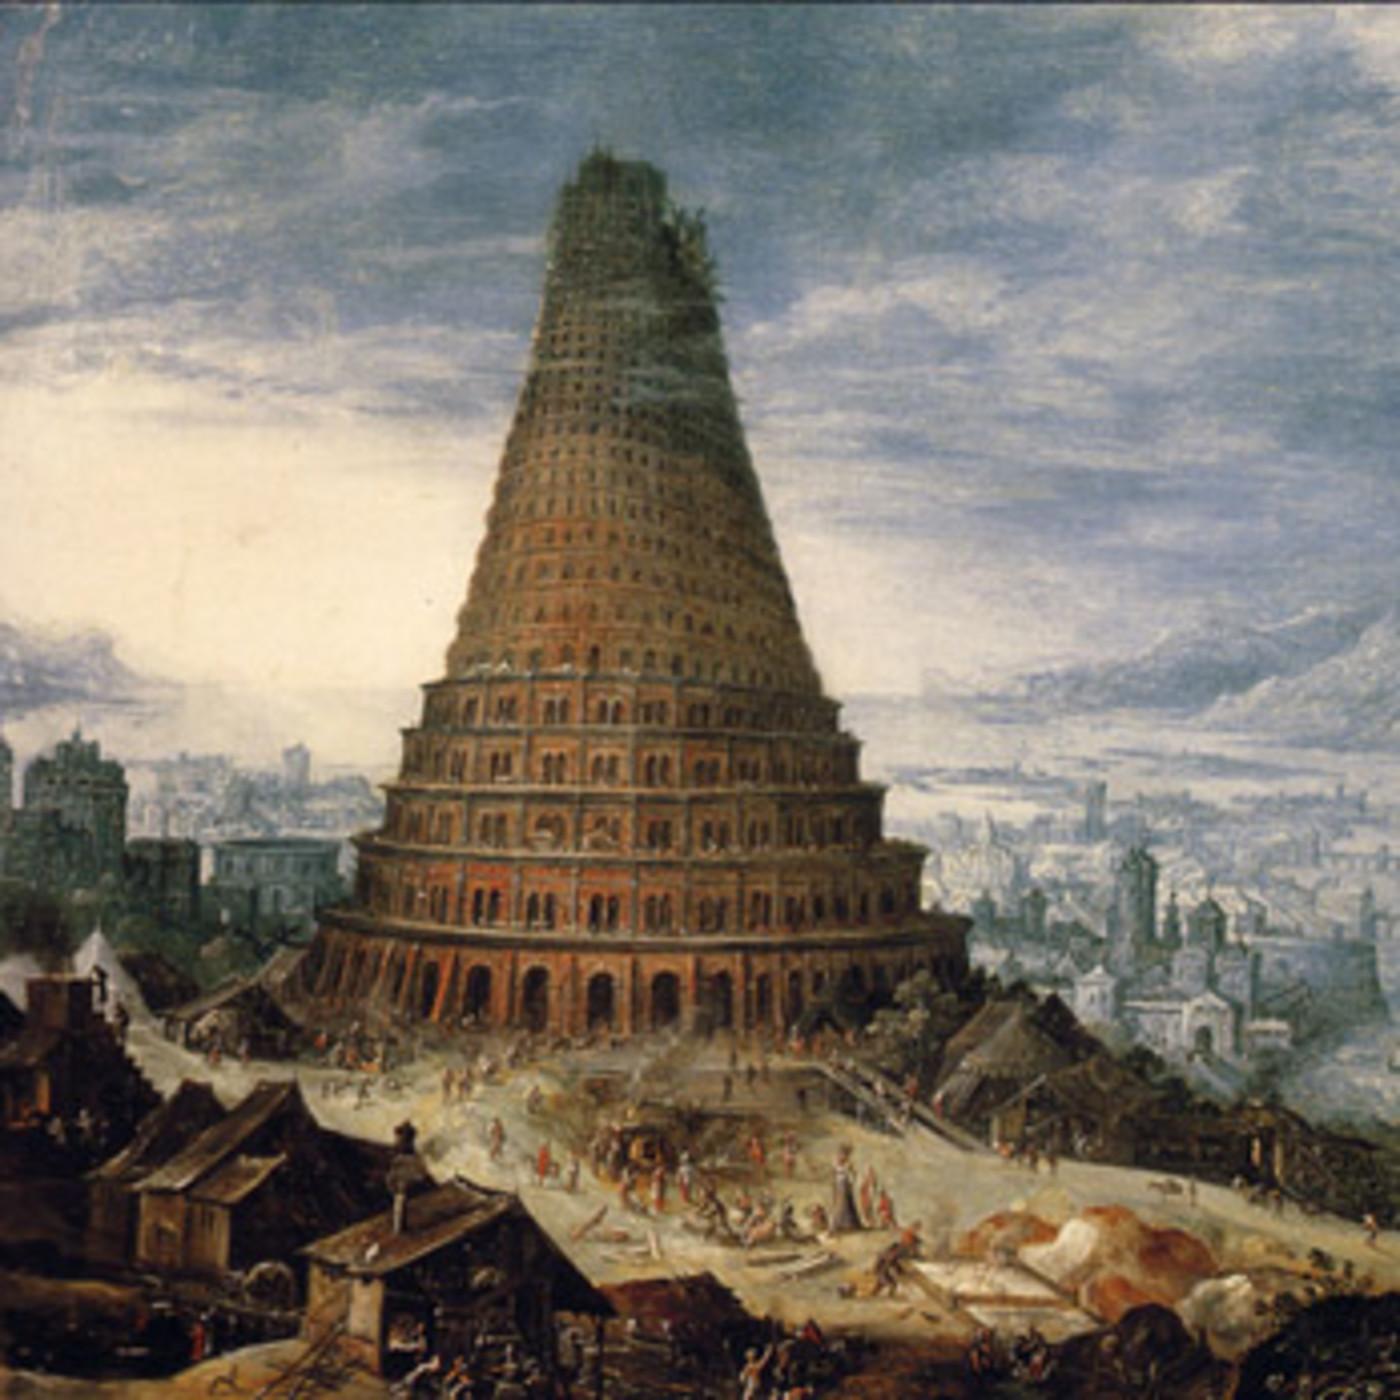 Desmontando la historia T4: La torre inclinada de Pisa · La torre de Babel